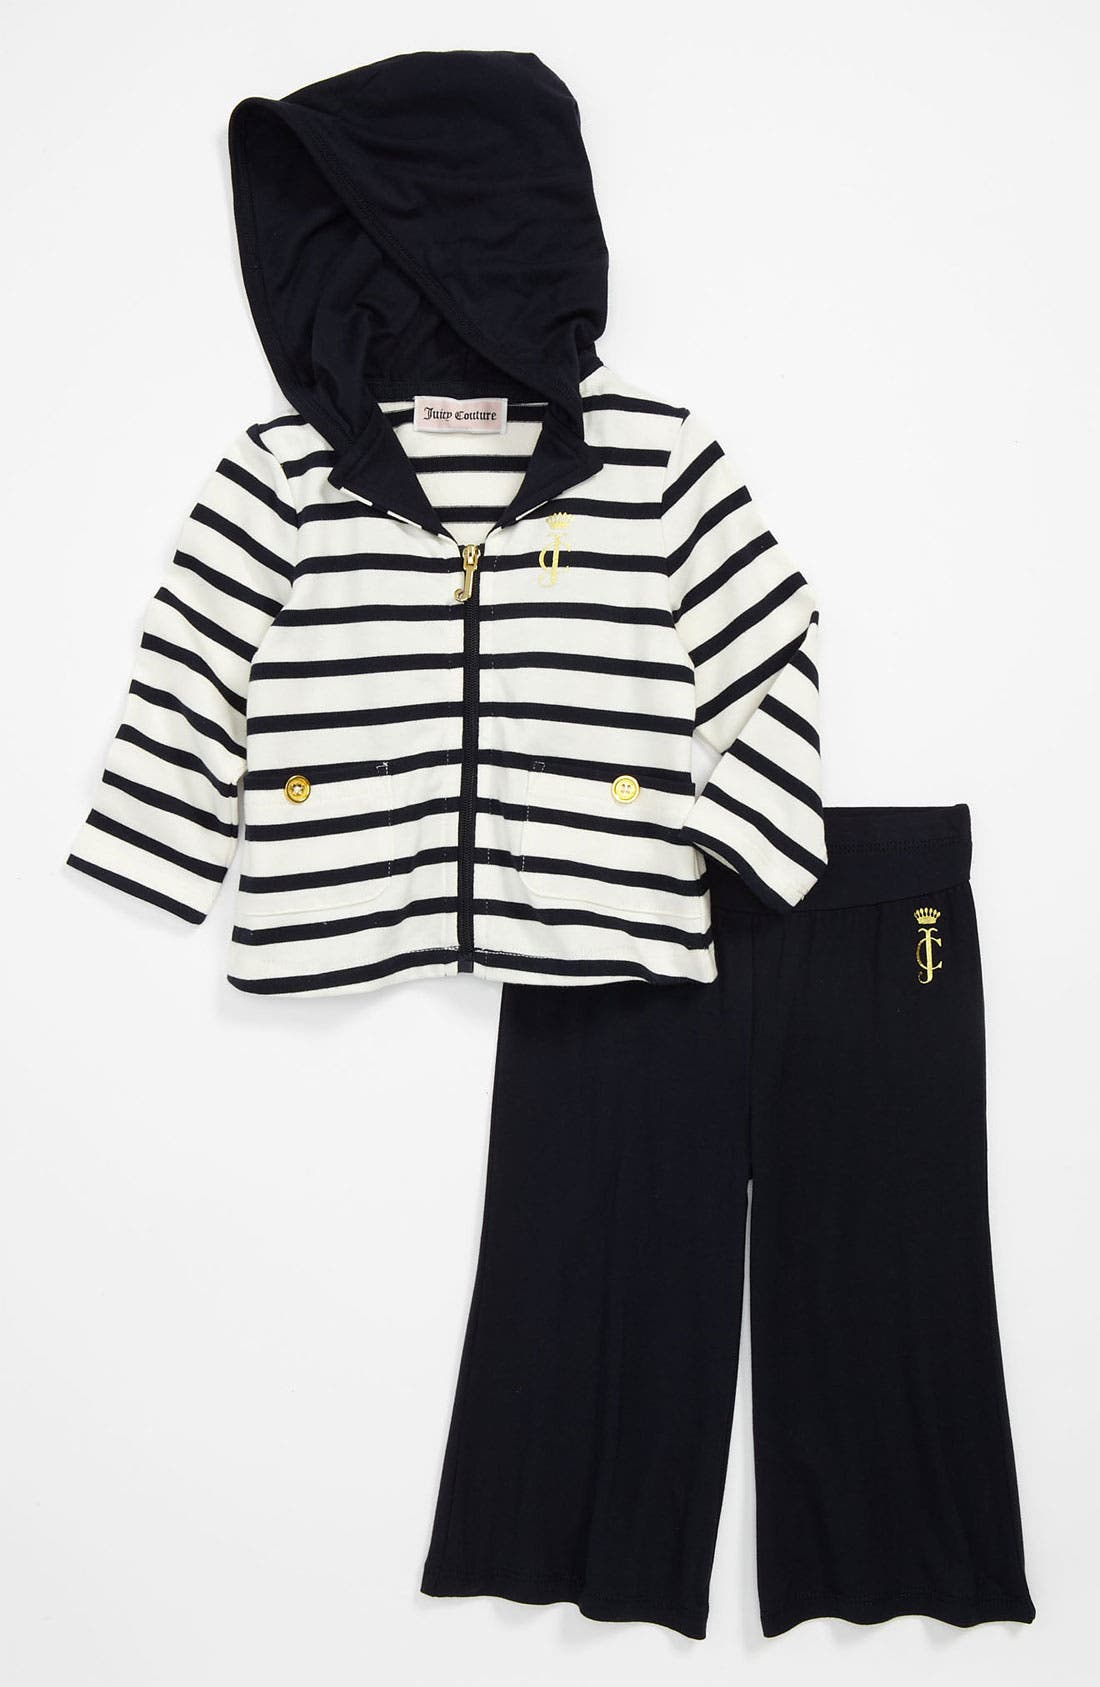 Alternate Image 1 Selected - Juicy Couture Hoodie & Pants (Infant)